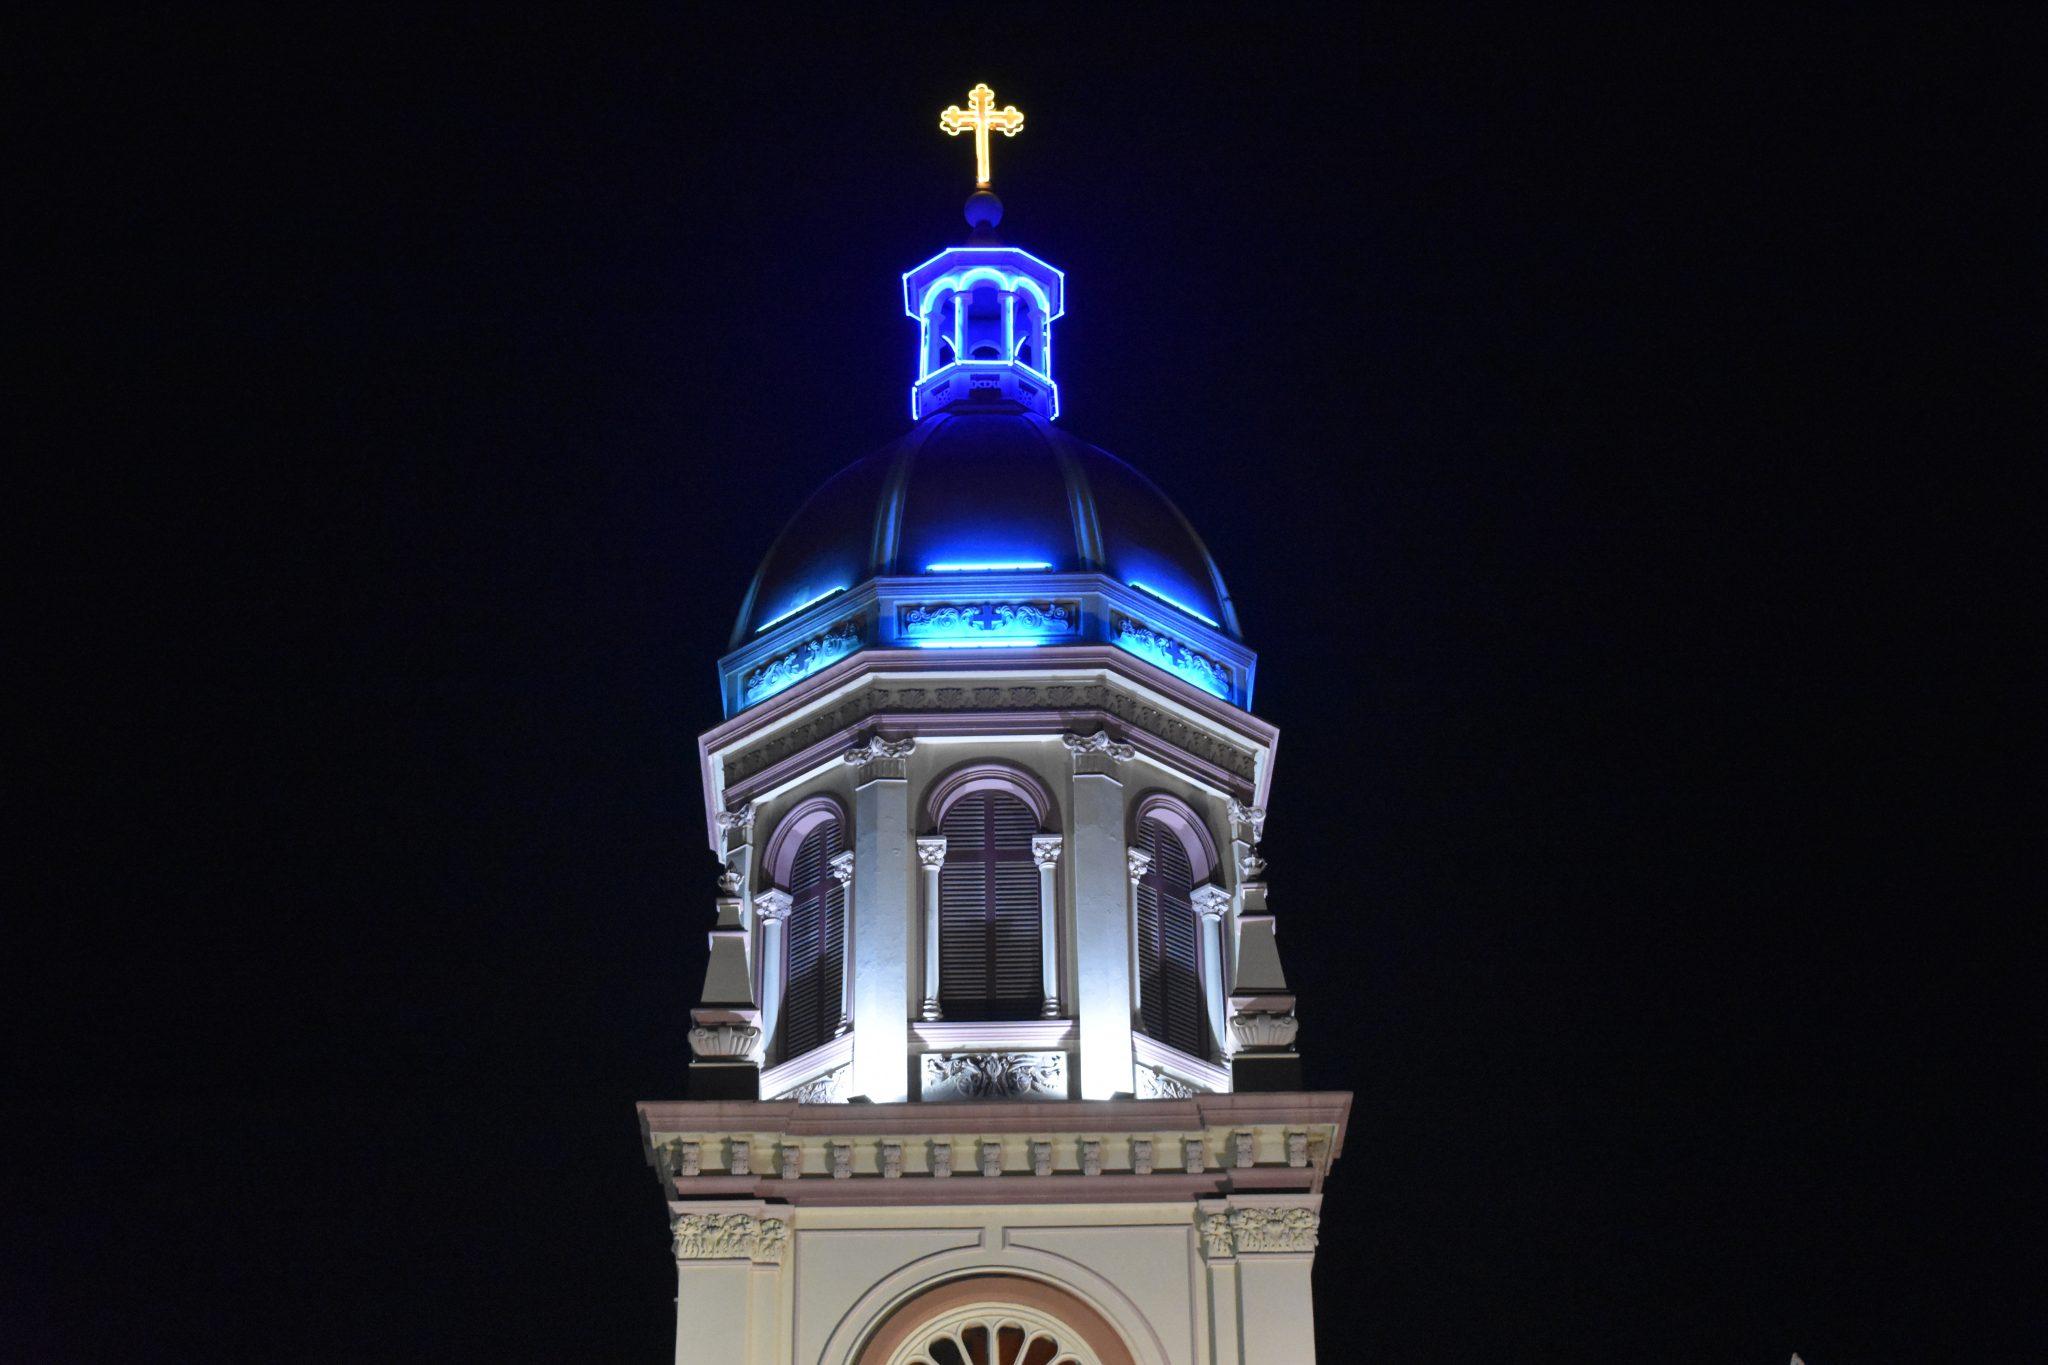 DSC 0767 - Santa Cruz Church